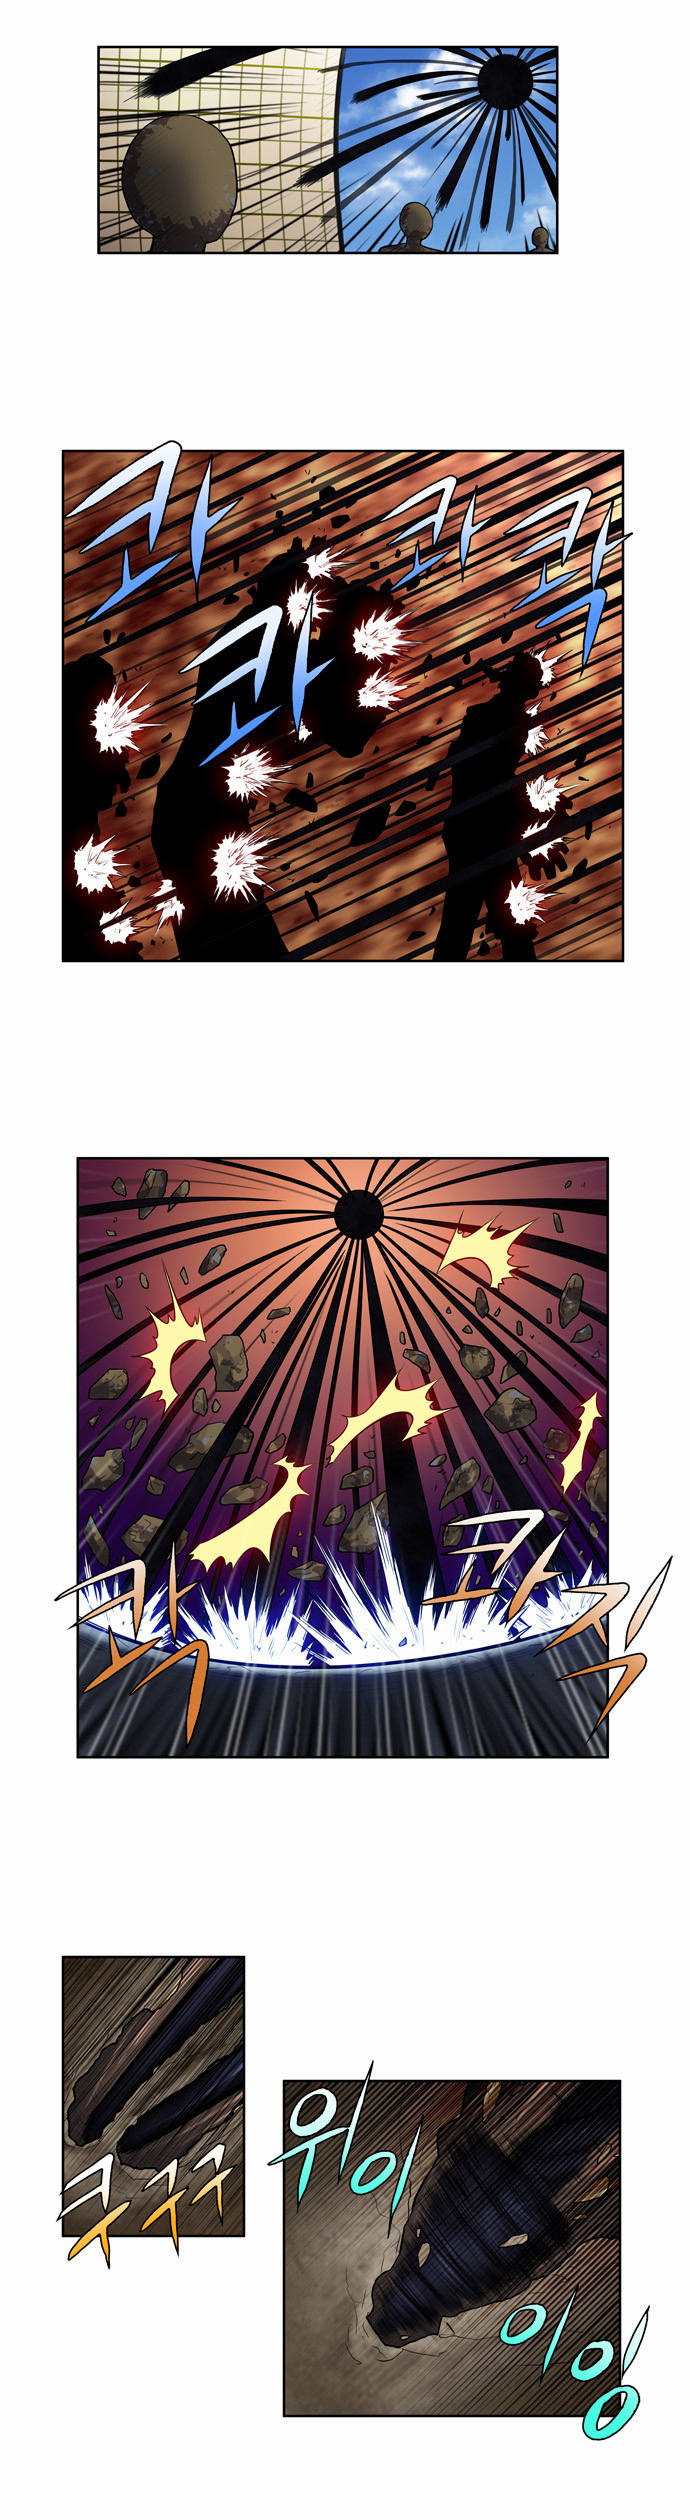 http://c5.ninemanga.com/es_manga/61/1725/439980/681ce394095ac91a7fa9cef0e0d47c16.jpg Page 10